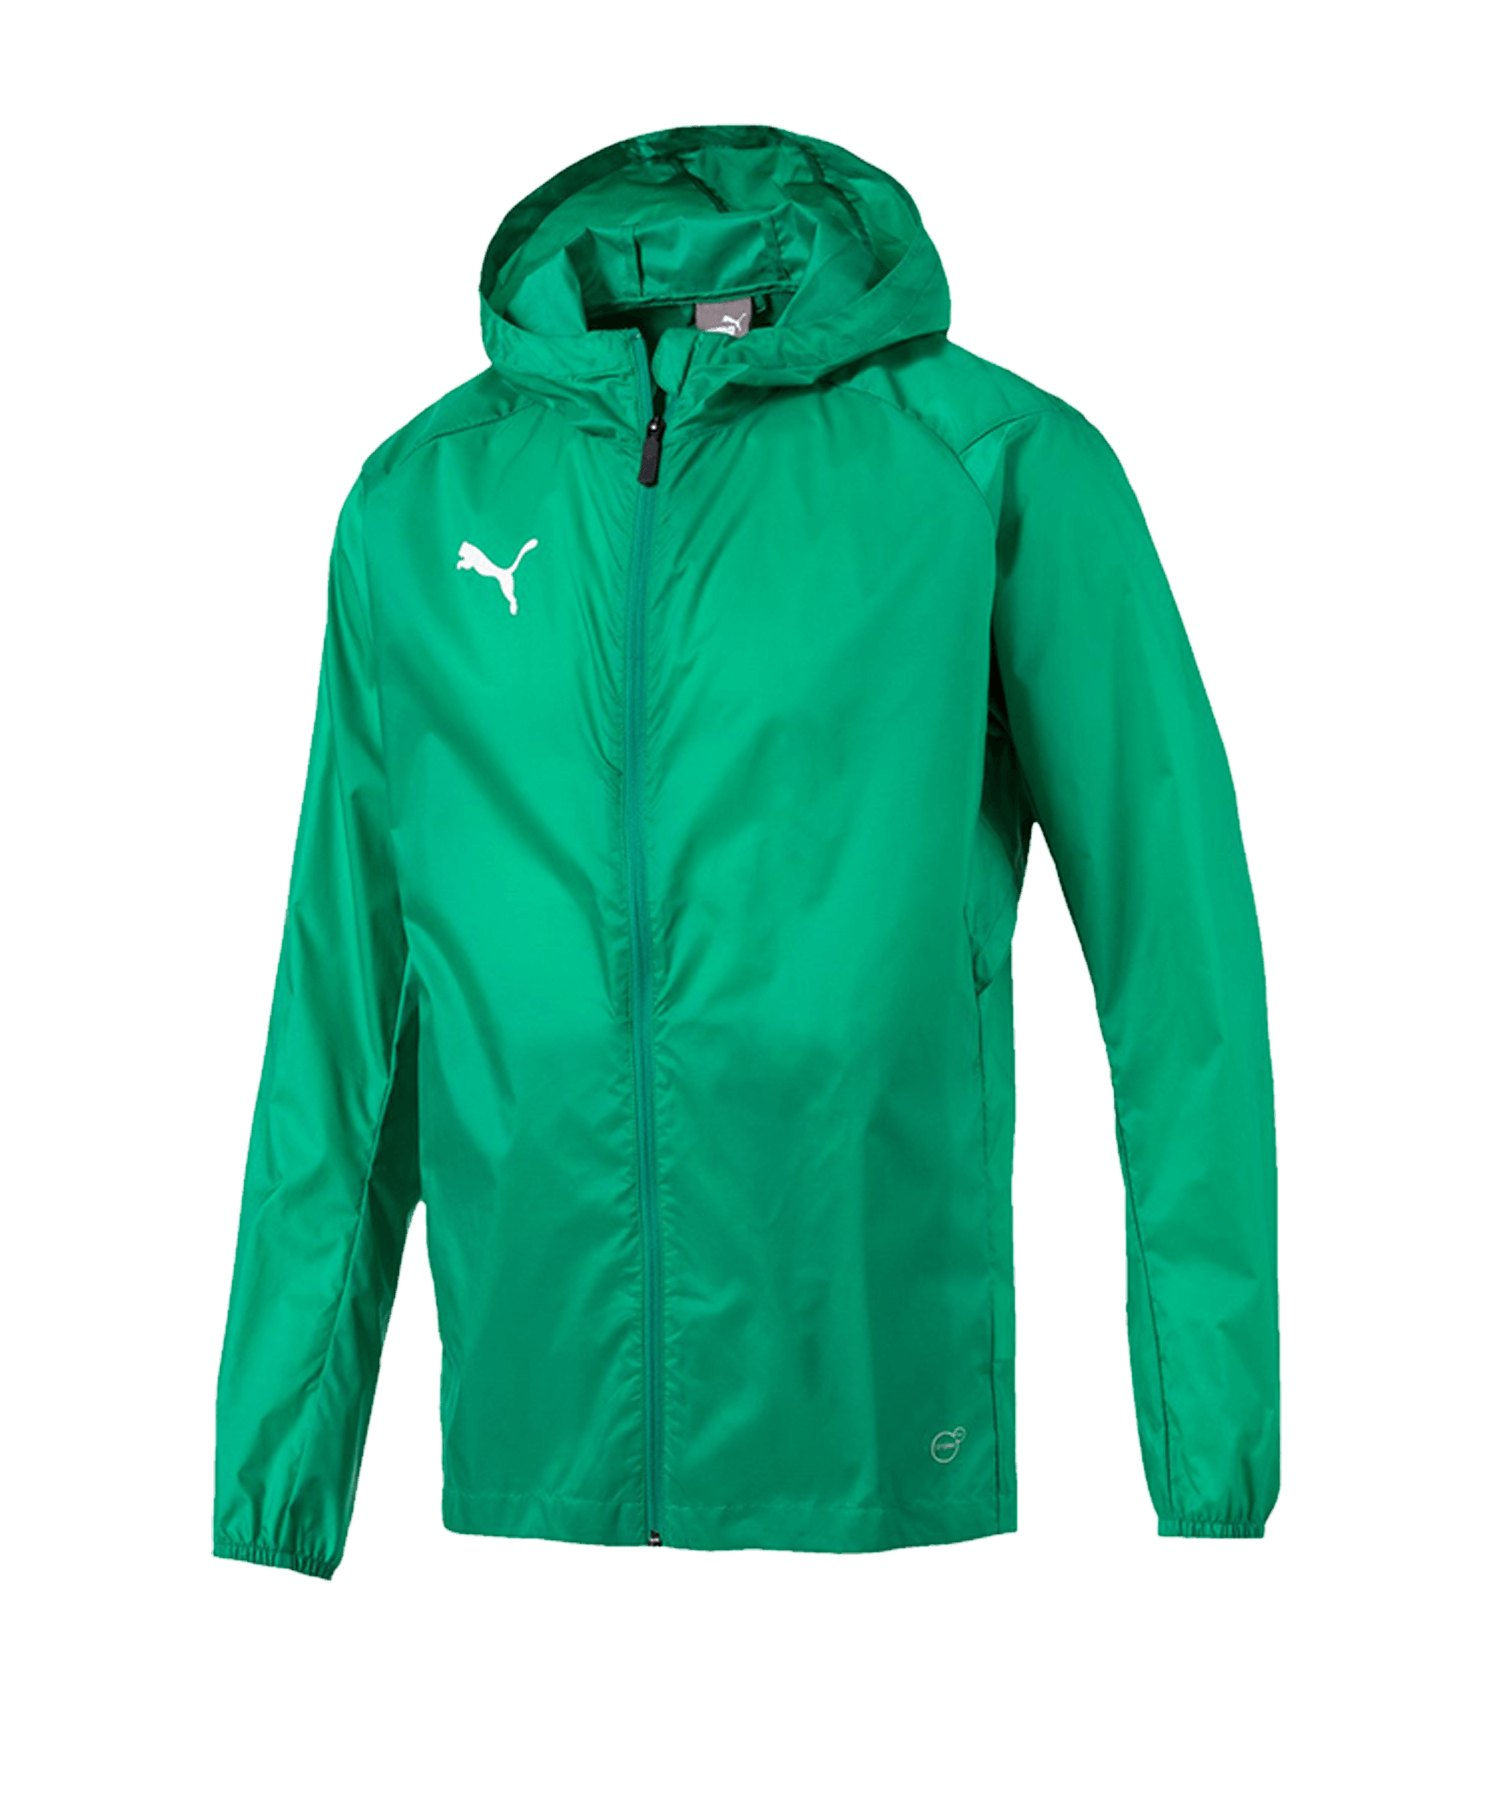 PUMA LIGA Training Rain Jacket Jacke Grün F05 - gruen